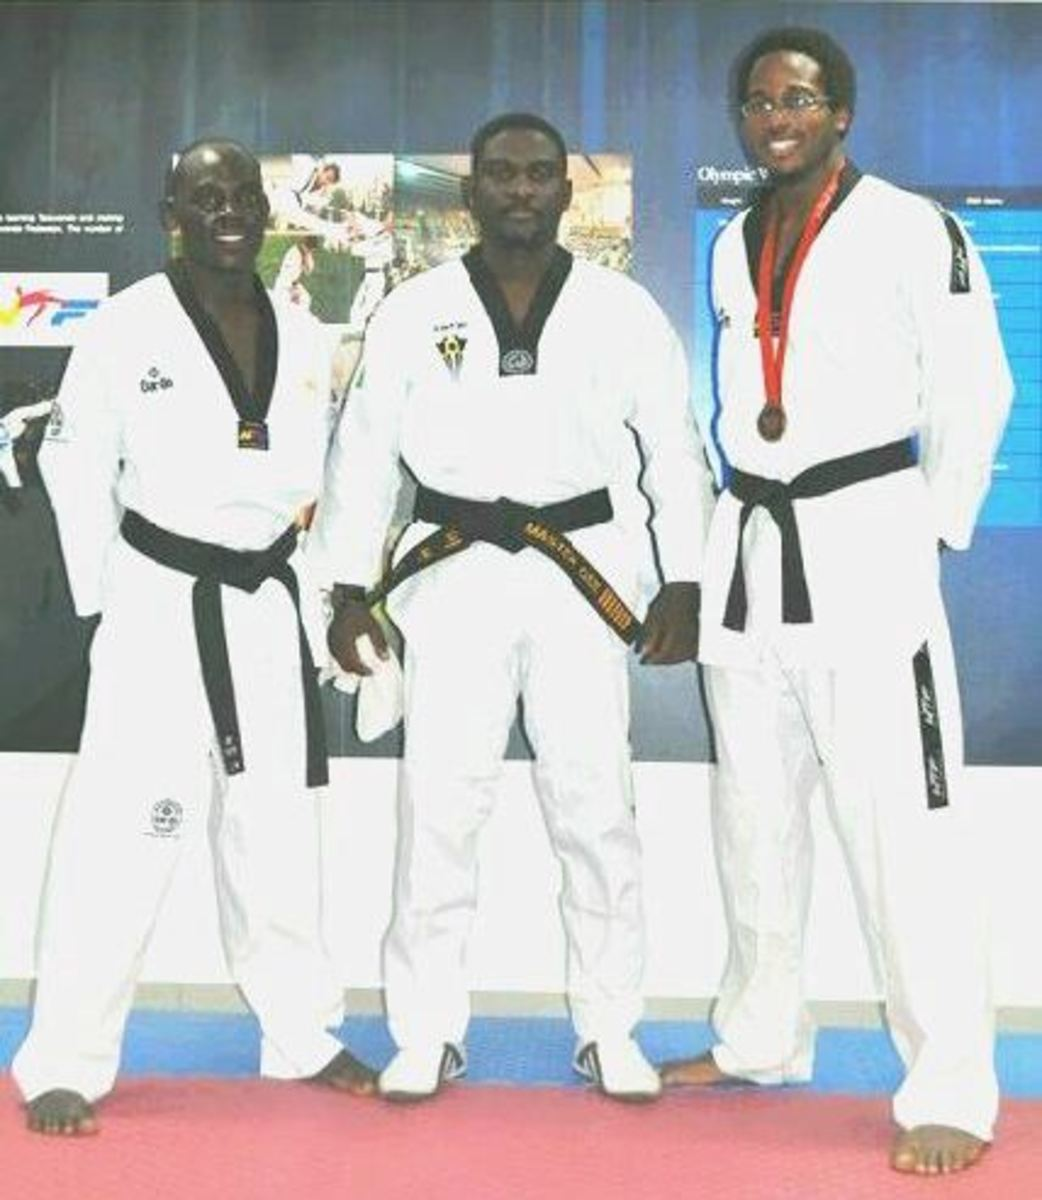 sports-history-ntf75-and-the-nigerian-taekwondo-team-in-the-2012-london-summer-olympics